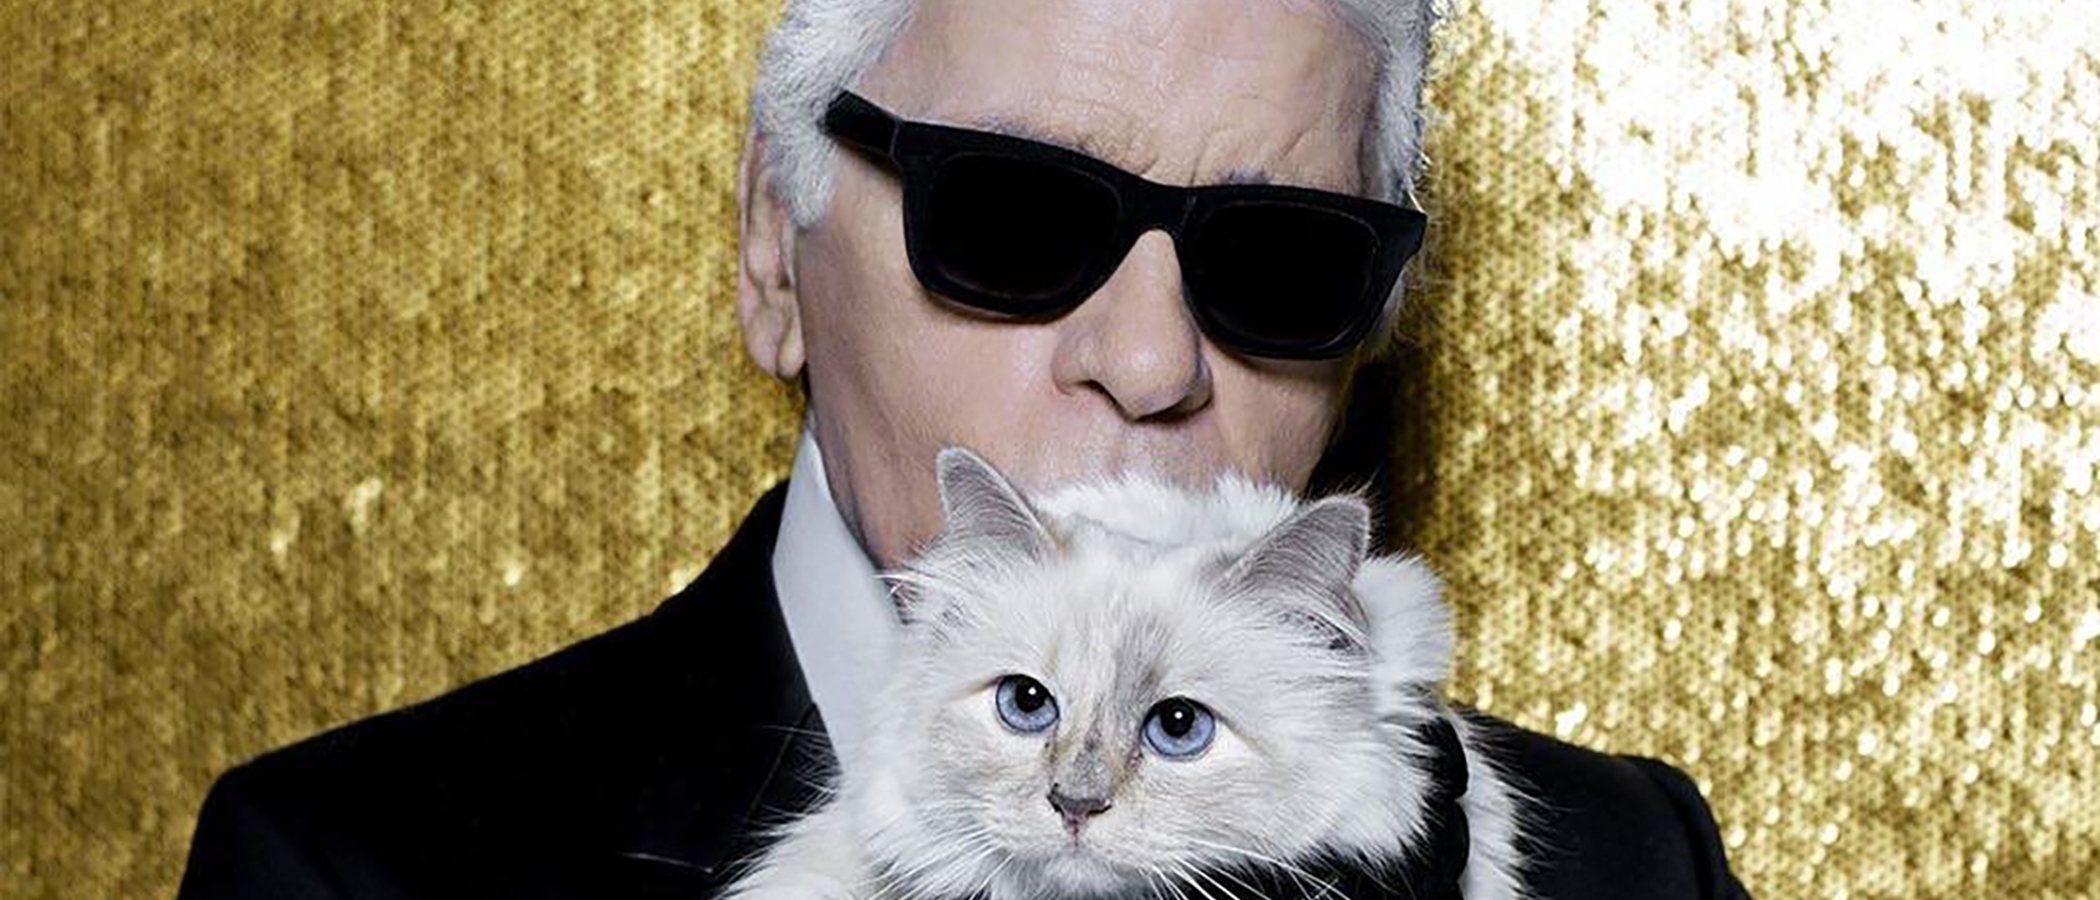 La historia de Choupette, la gata influencer y heredera de la fortuna de Karl Lagerfeld